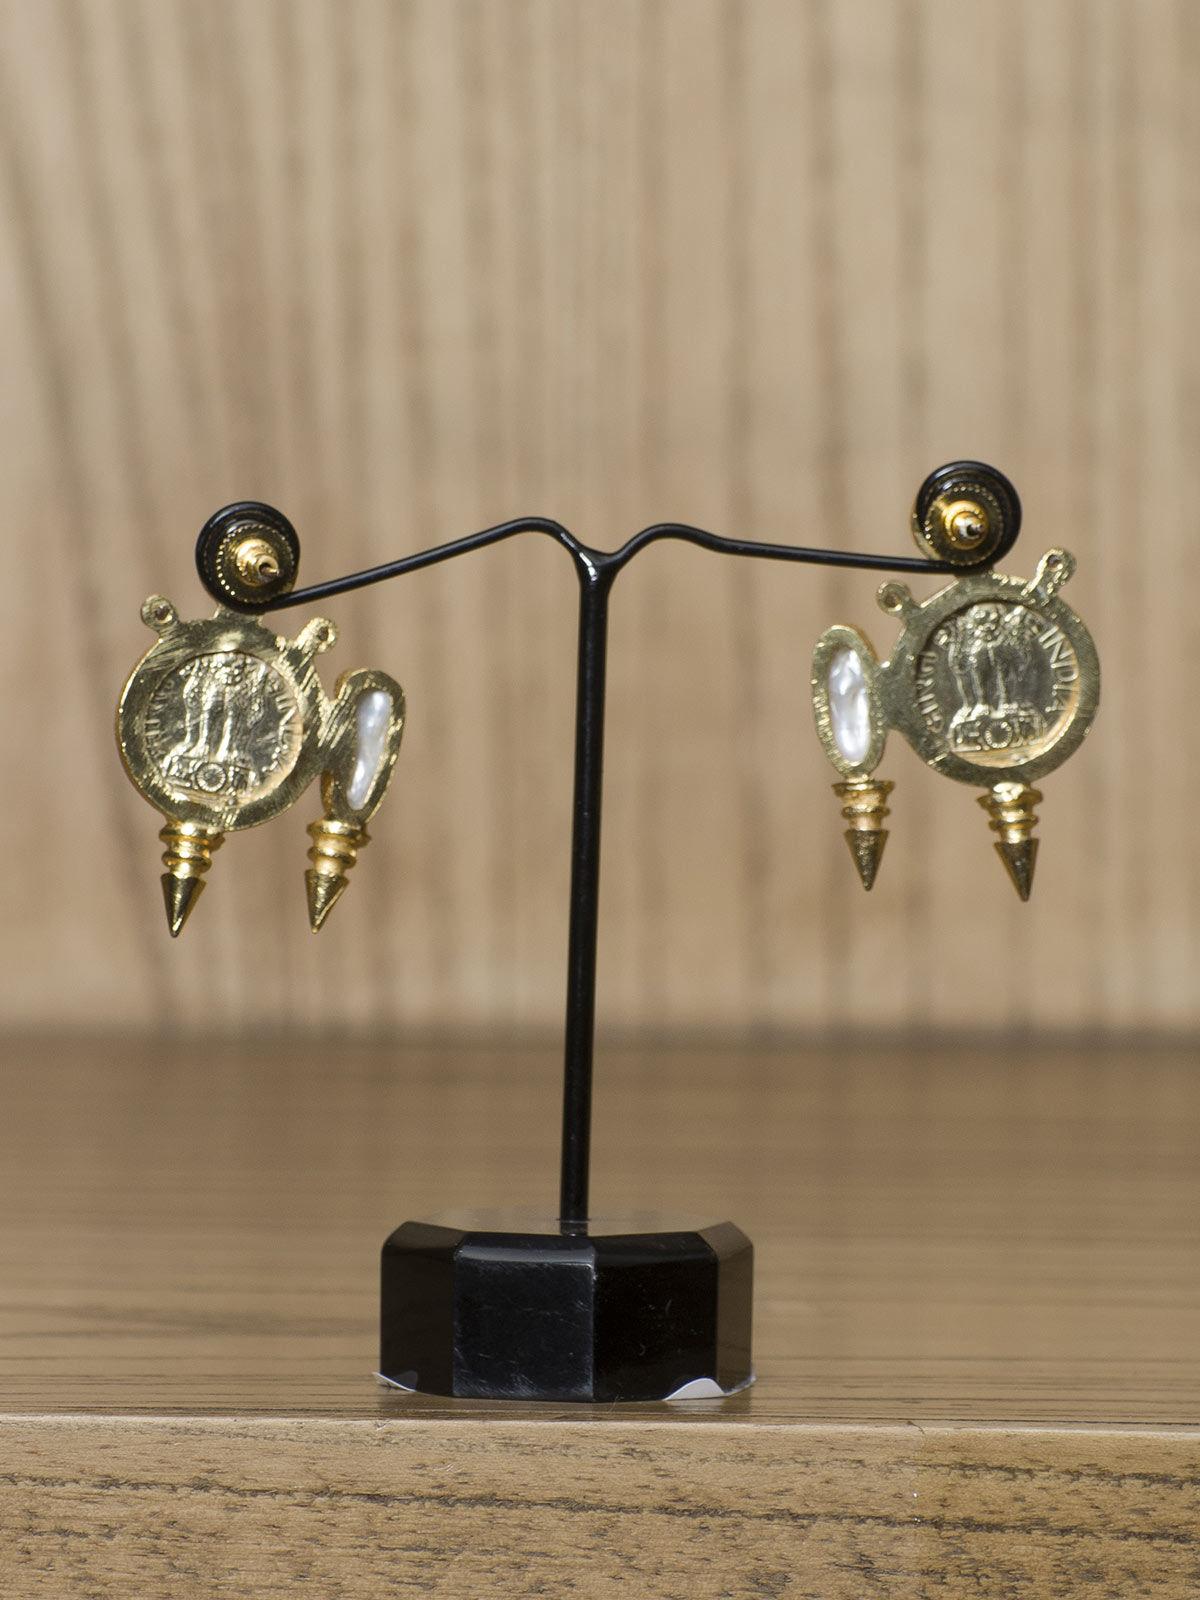 Indian August round shaped semi-precious metal earrings